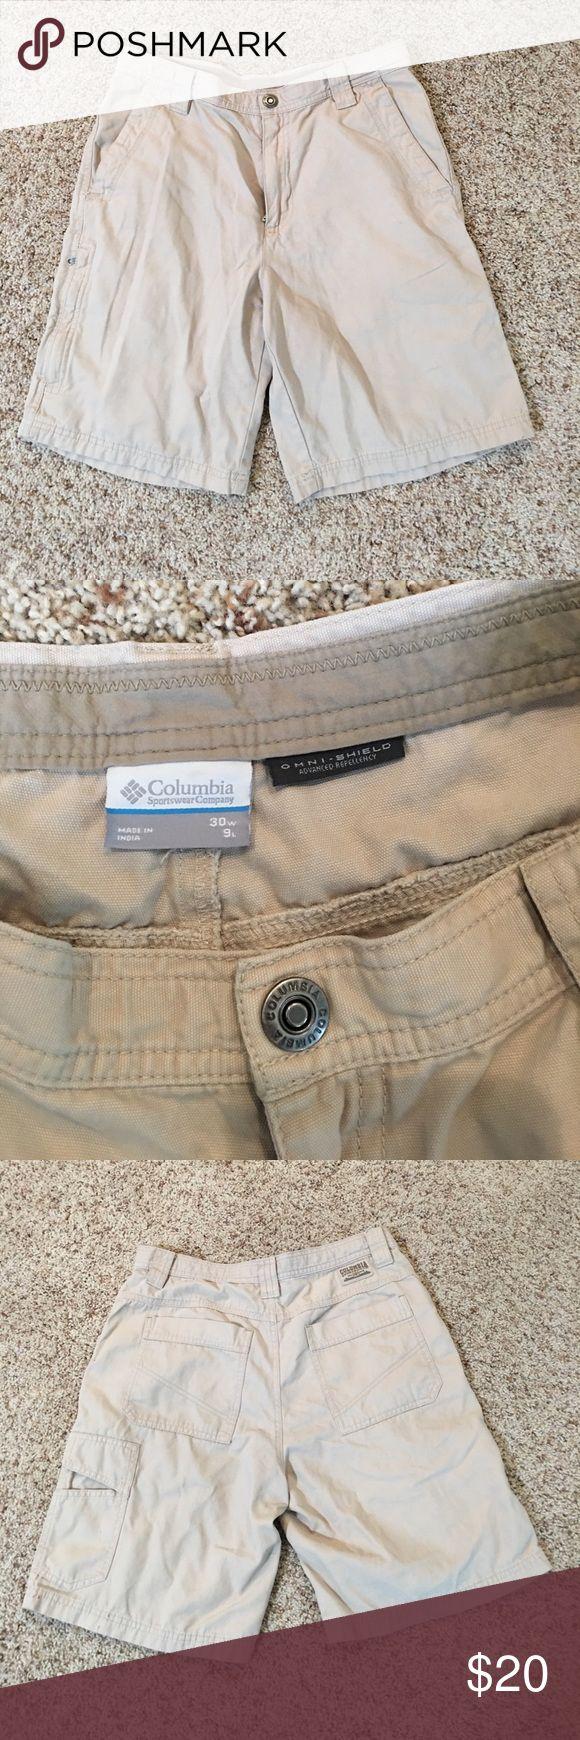 Columbia sportswear company cargo shorts Omni Shield advanced repellency made by Columbia sportswear company. Small lipstick smudge on cuff as shown in the image. Columbia Shorts Cargo